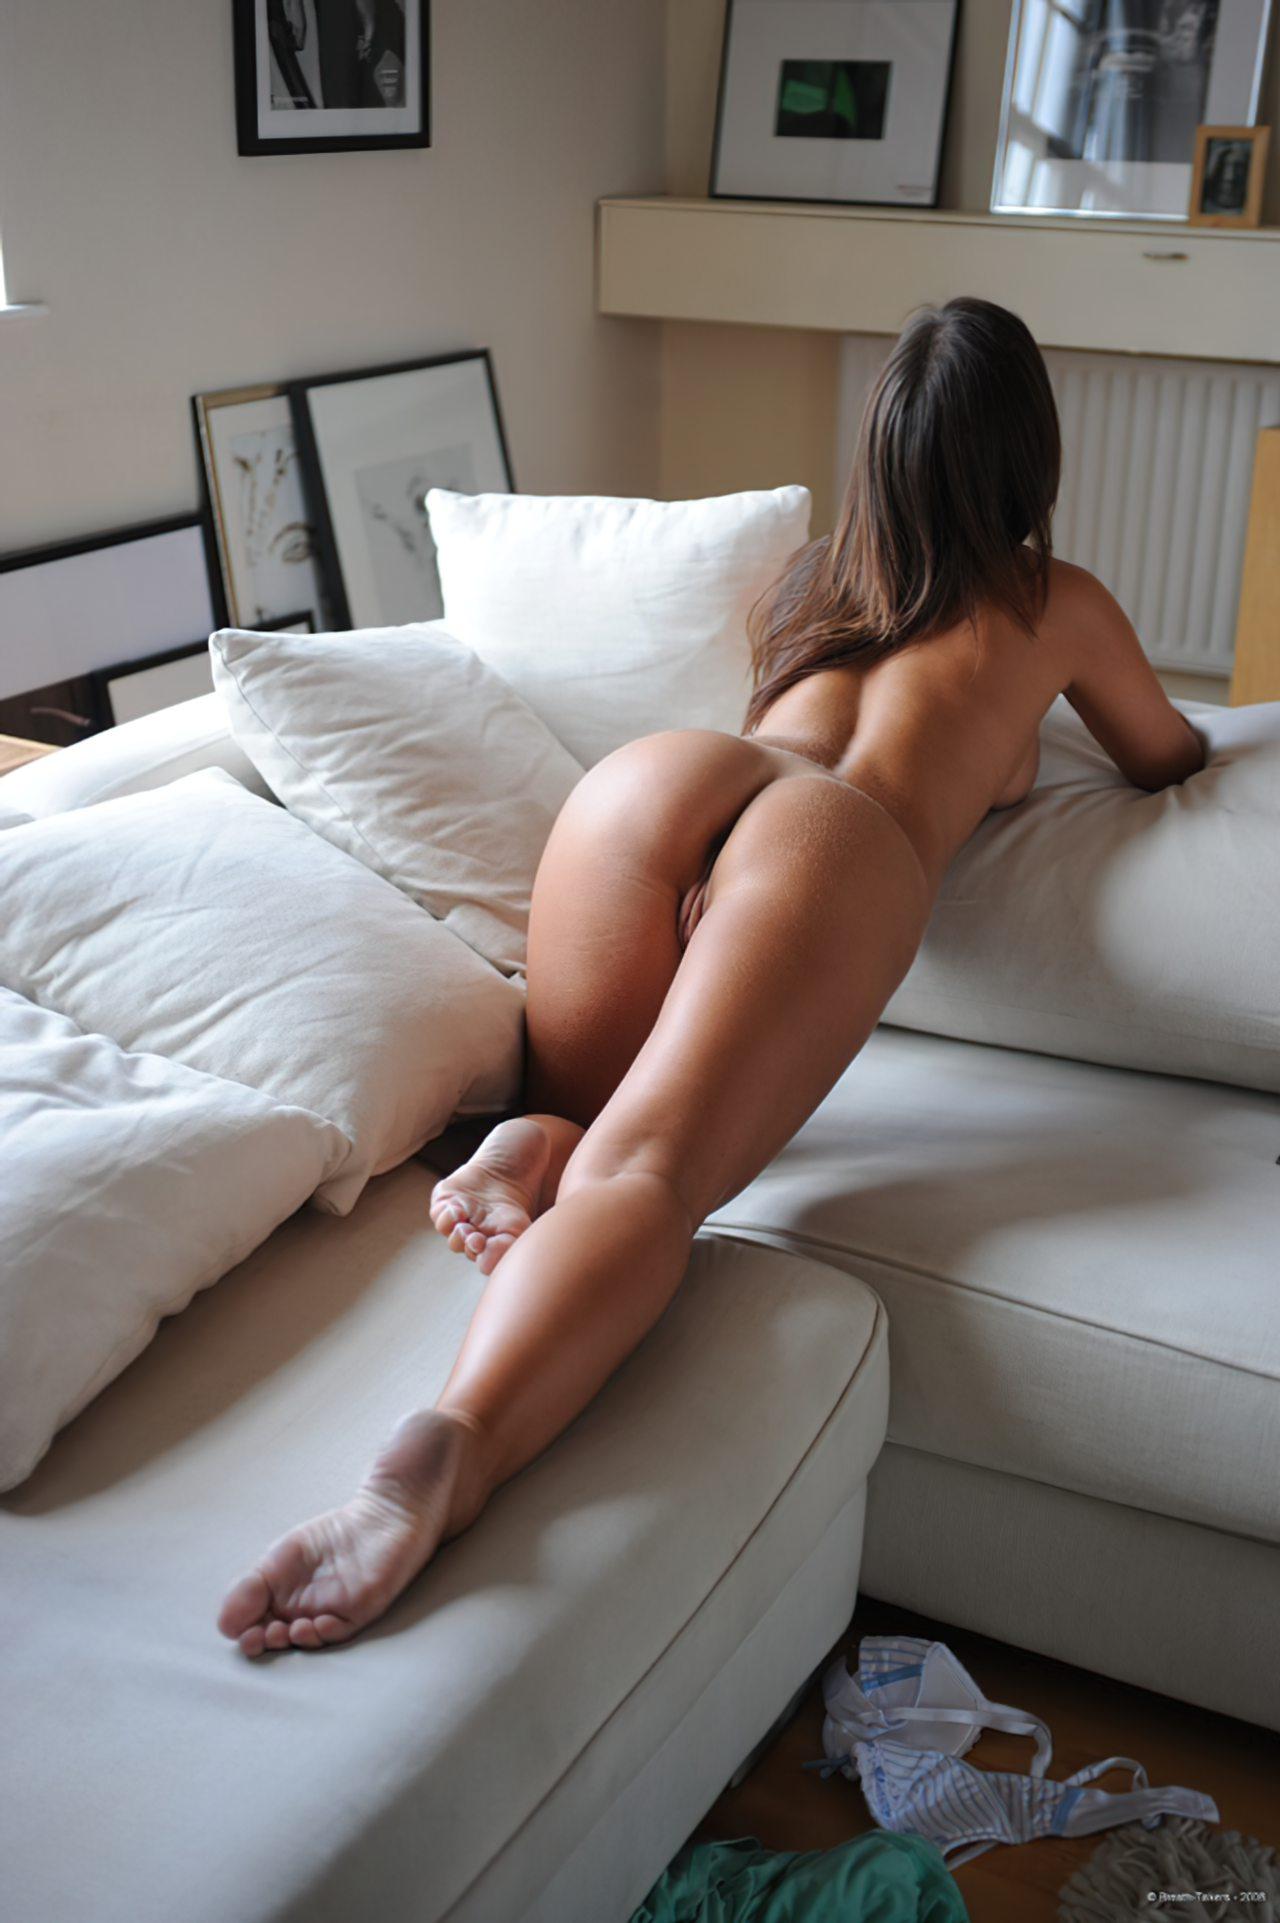 Mulher Nua no Sofá